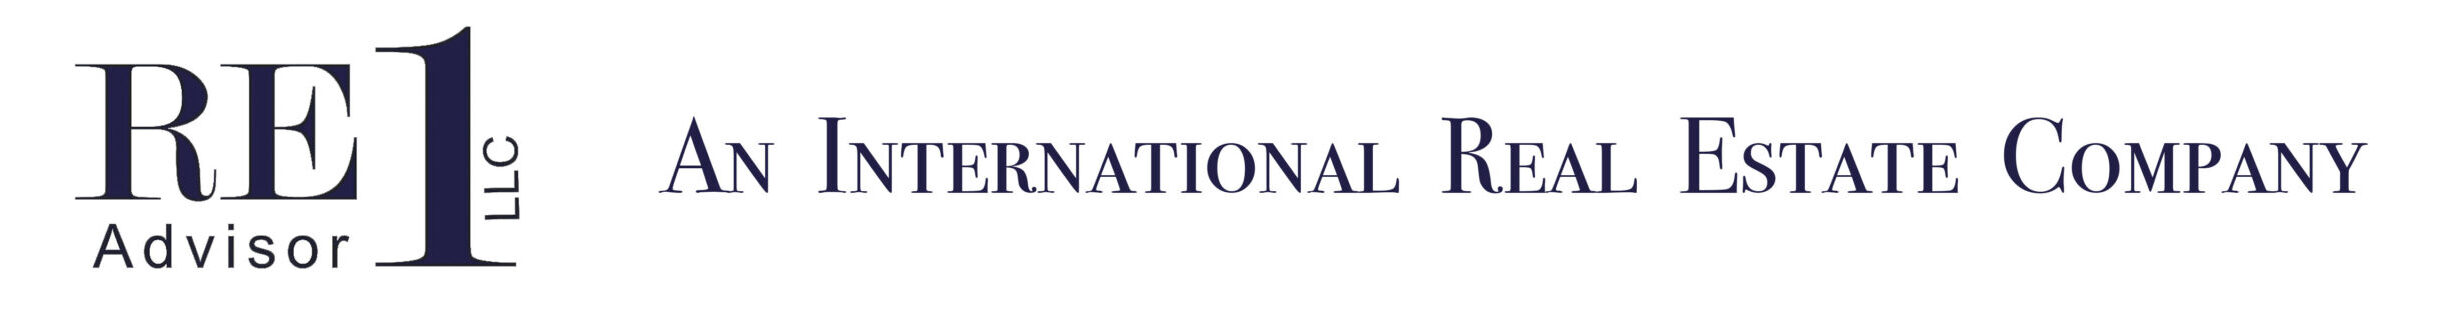 An International Real Estate Company